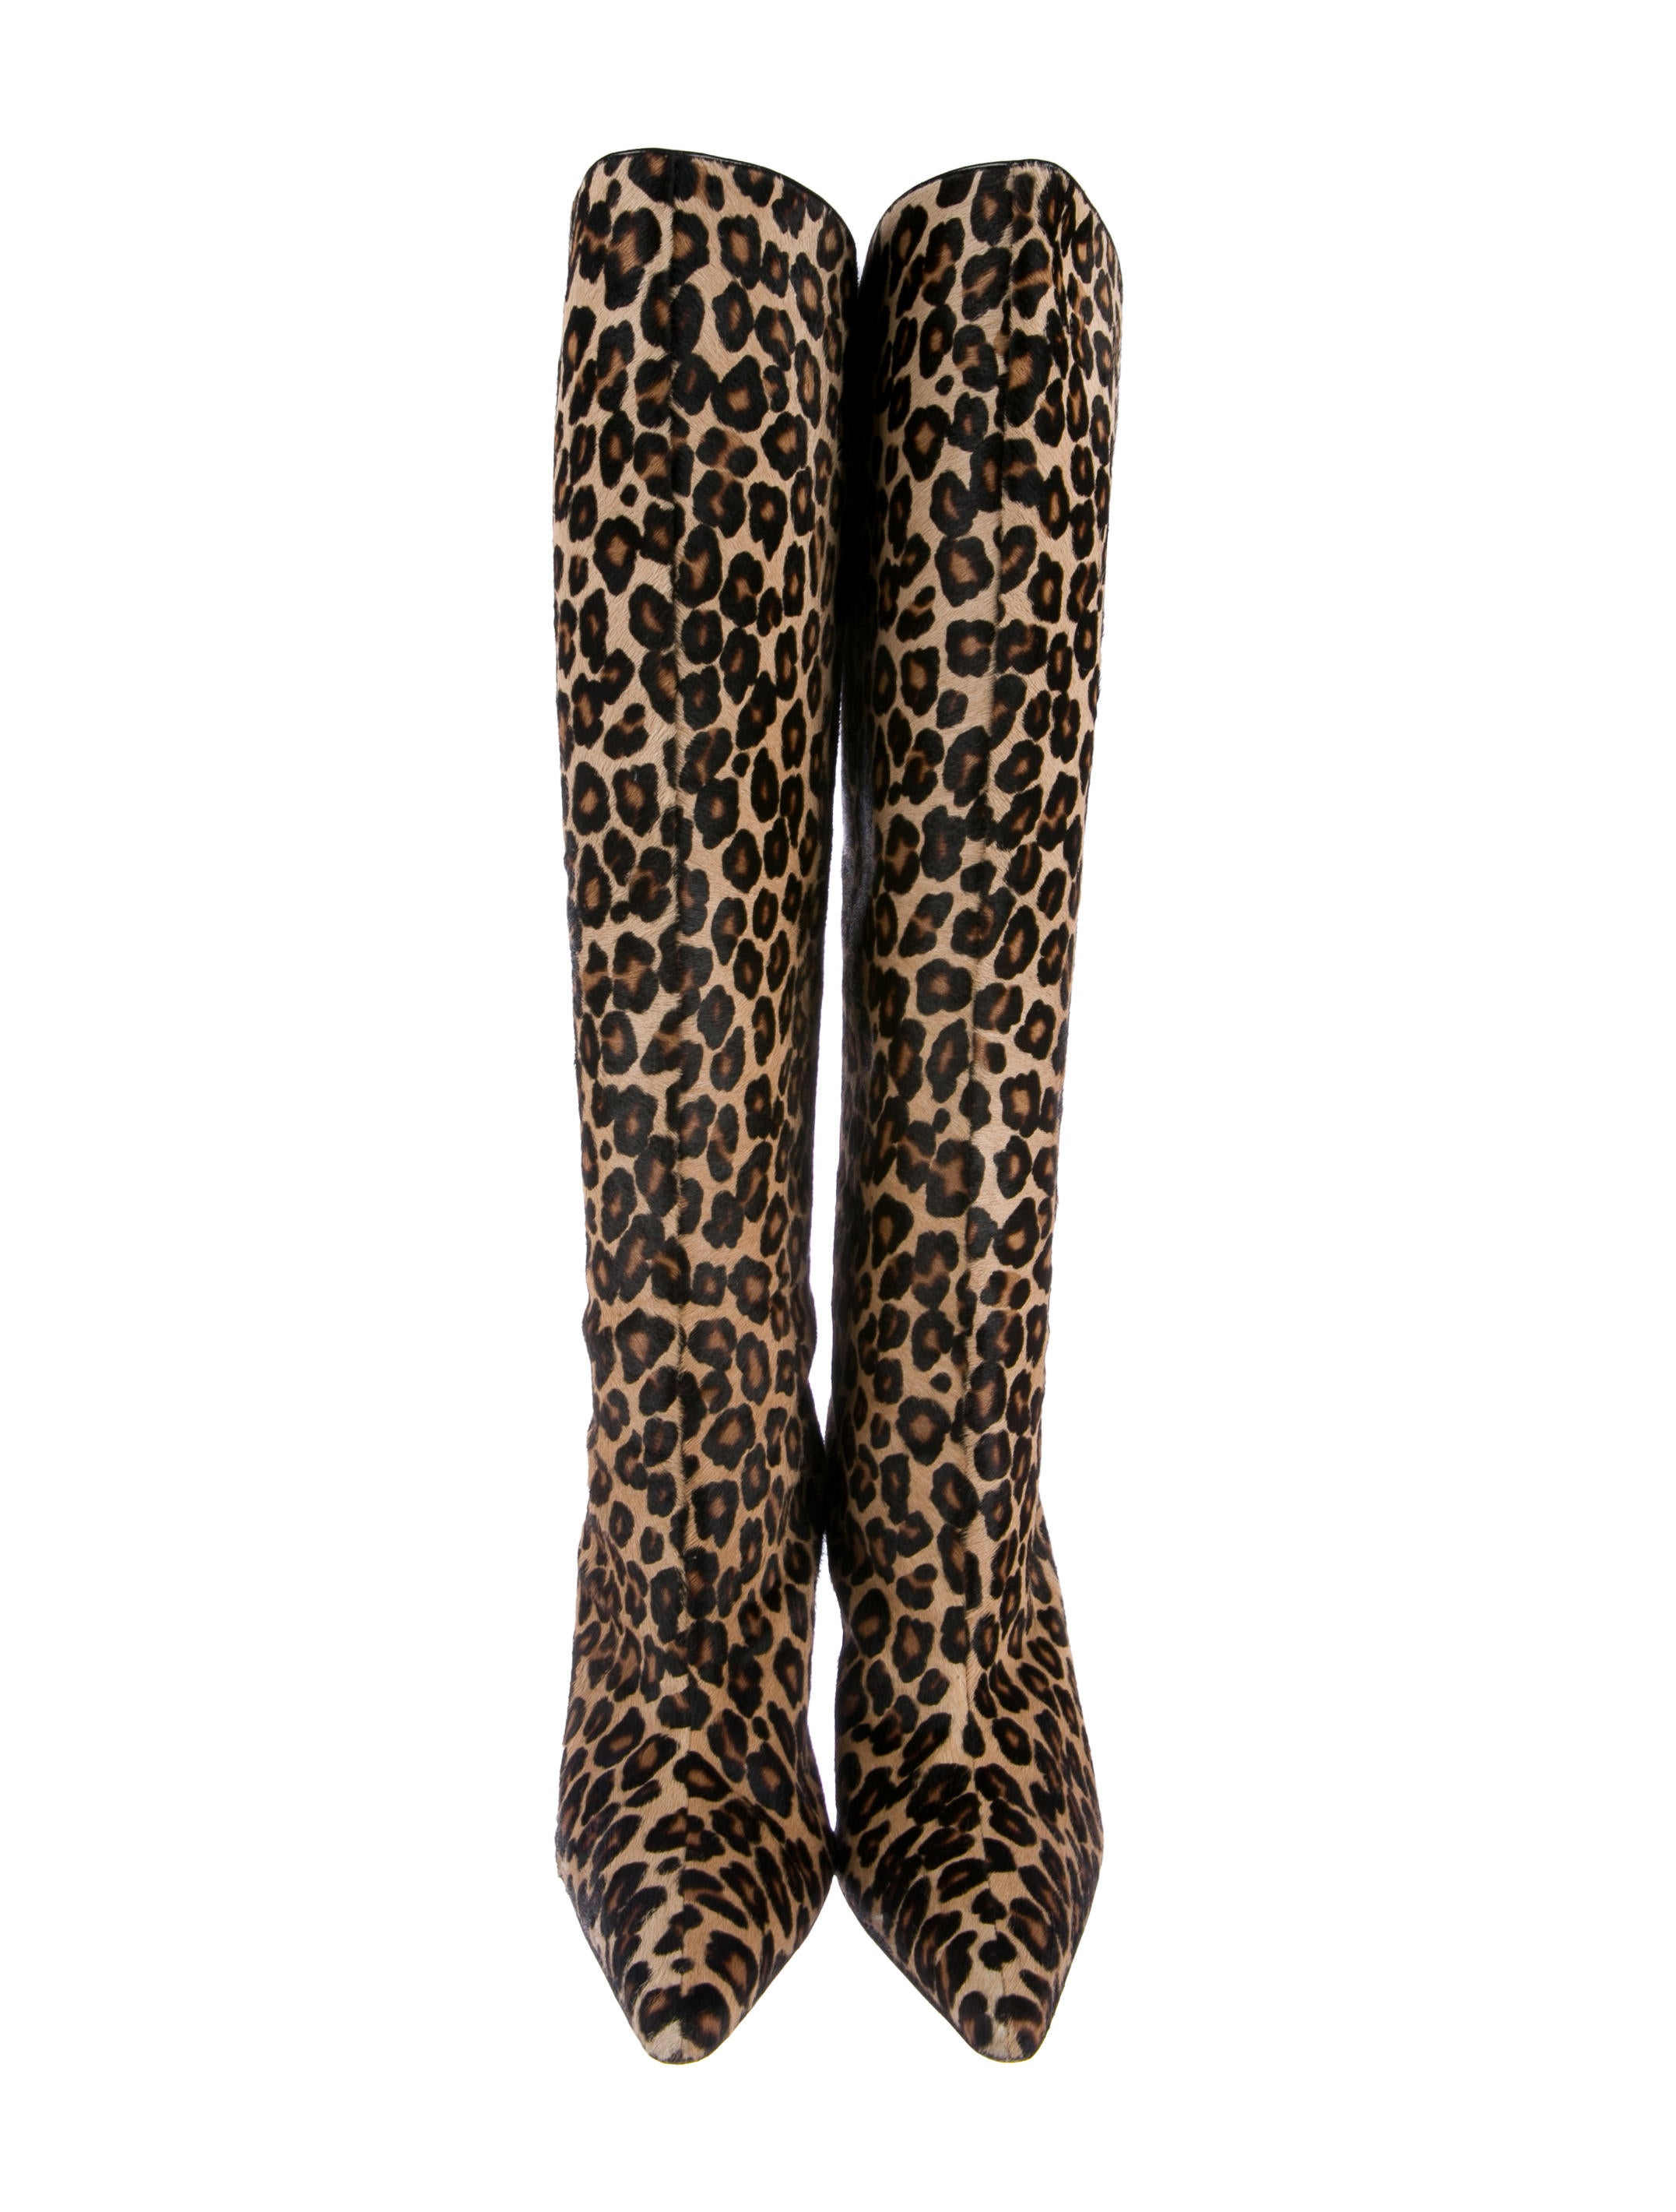 Manolo Blahnik Leopard Ponyhair Knee-High Boots cheapest price sale online esK1Jlj1